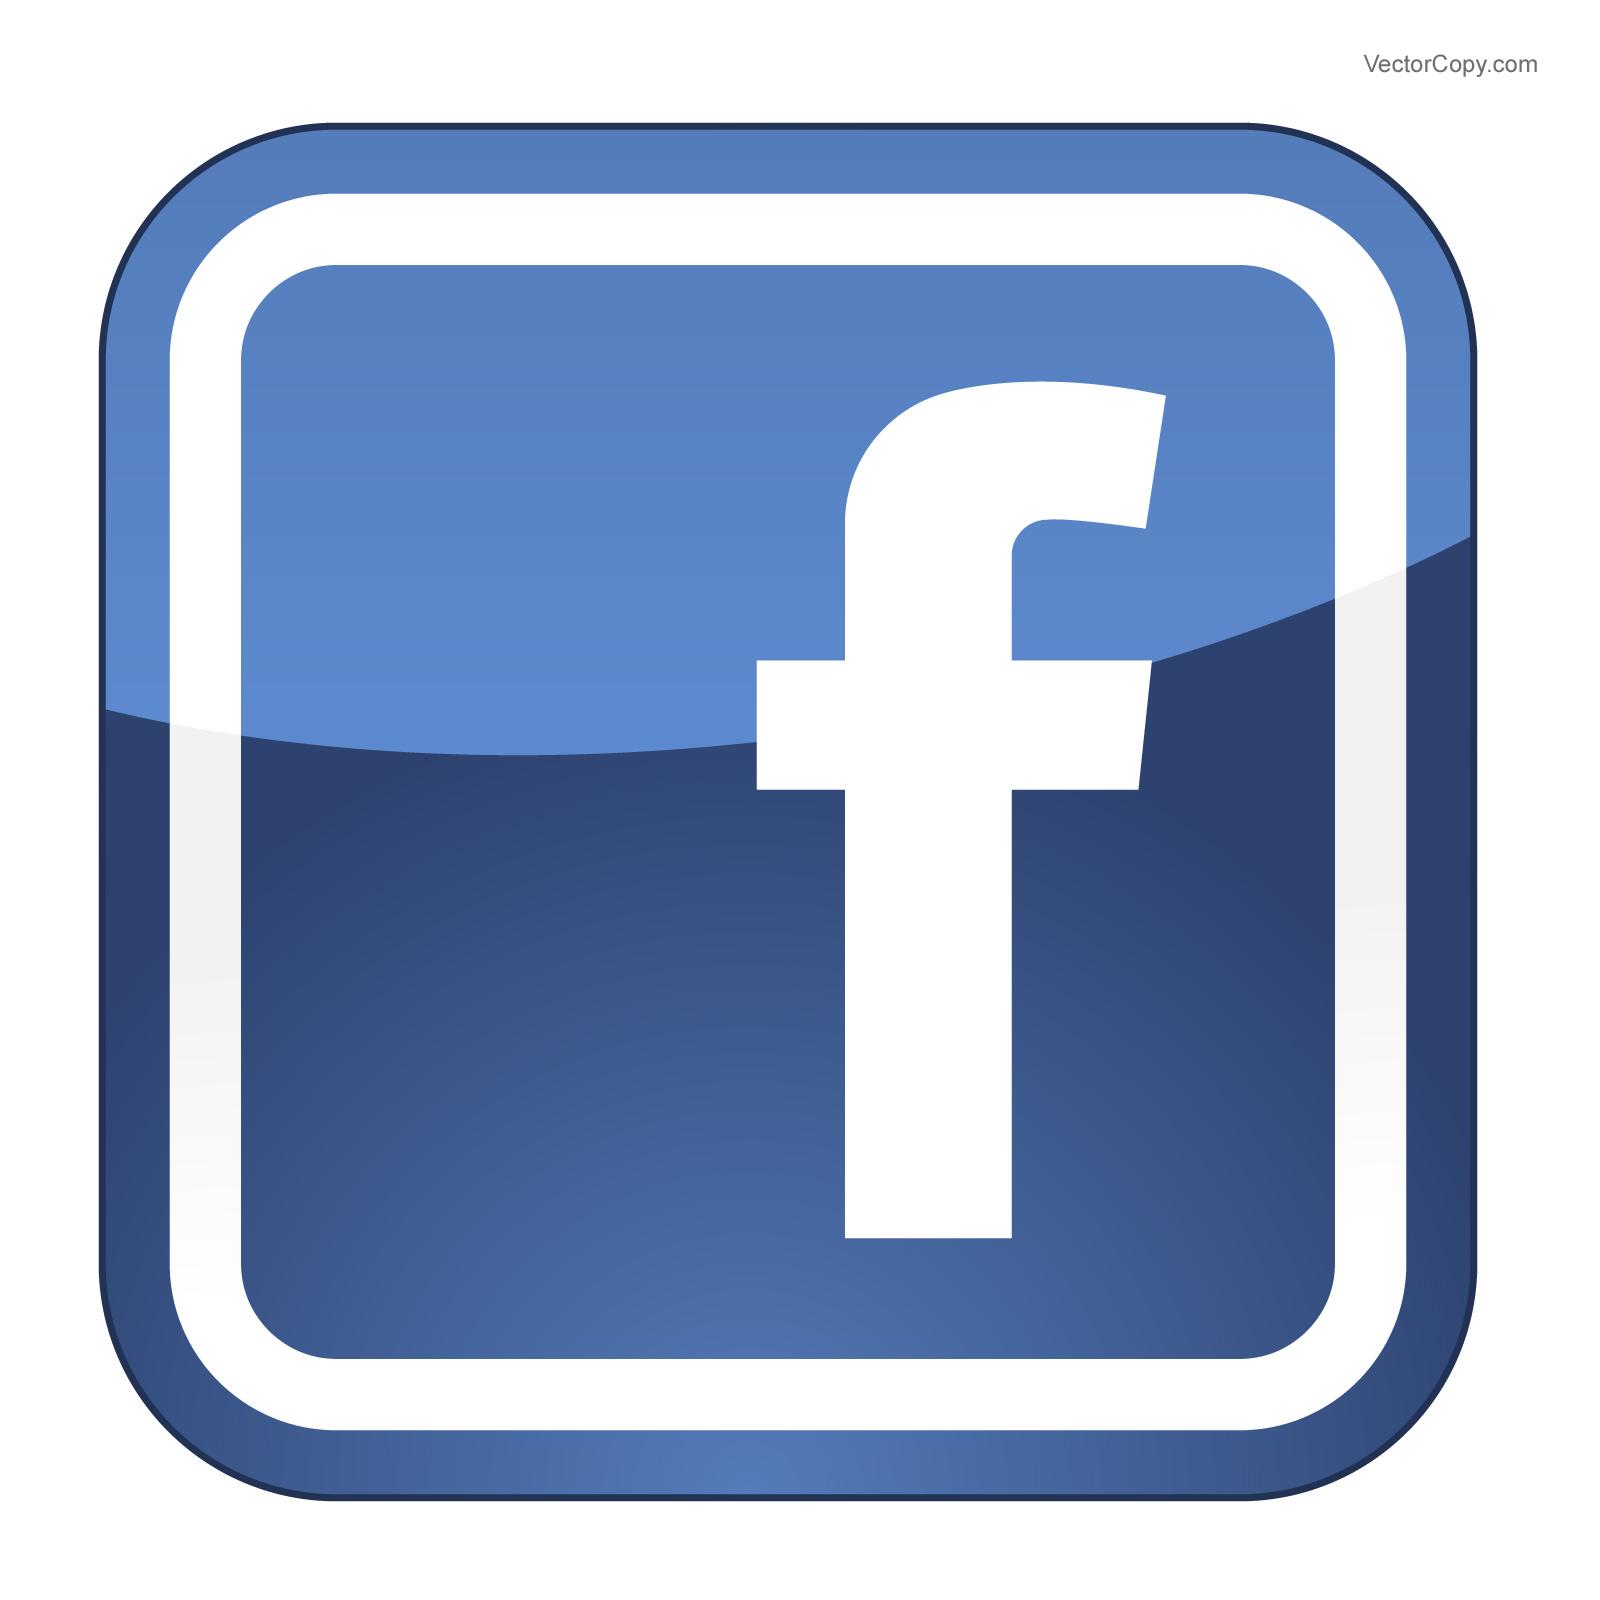 Symbol clipart facebook Facebook Clip Clipart  Free